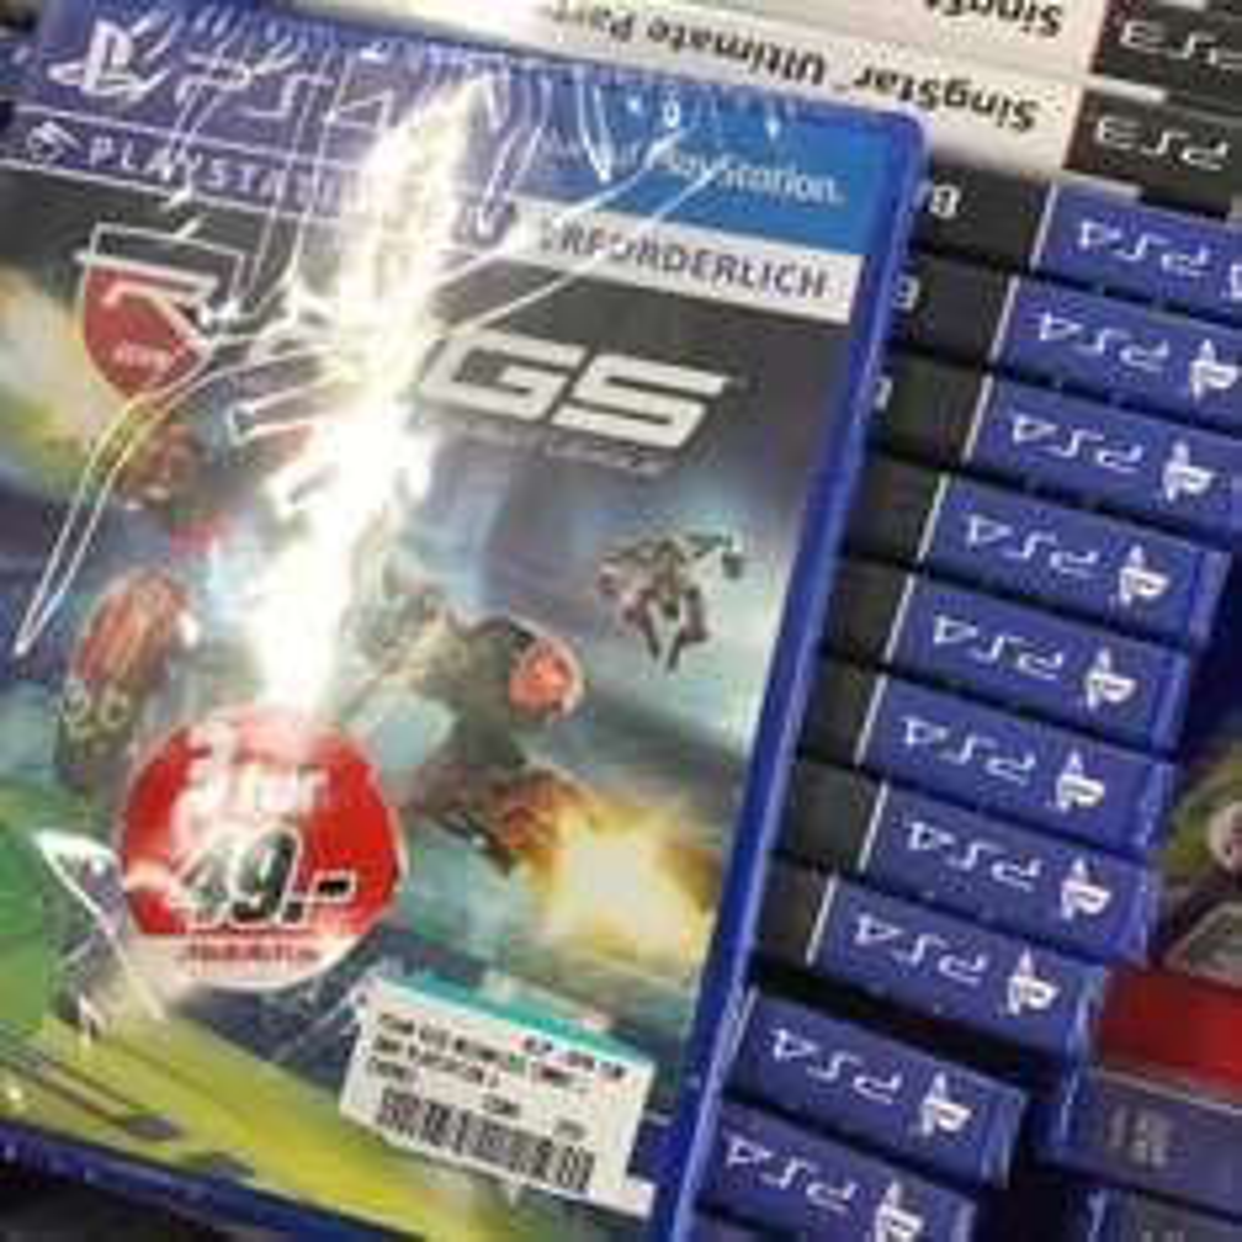 [ Lokal Media Markt Halstenbek ] Rigs PS4 3 für 49€